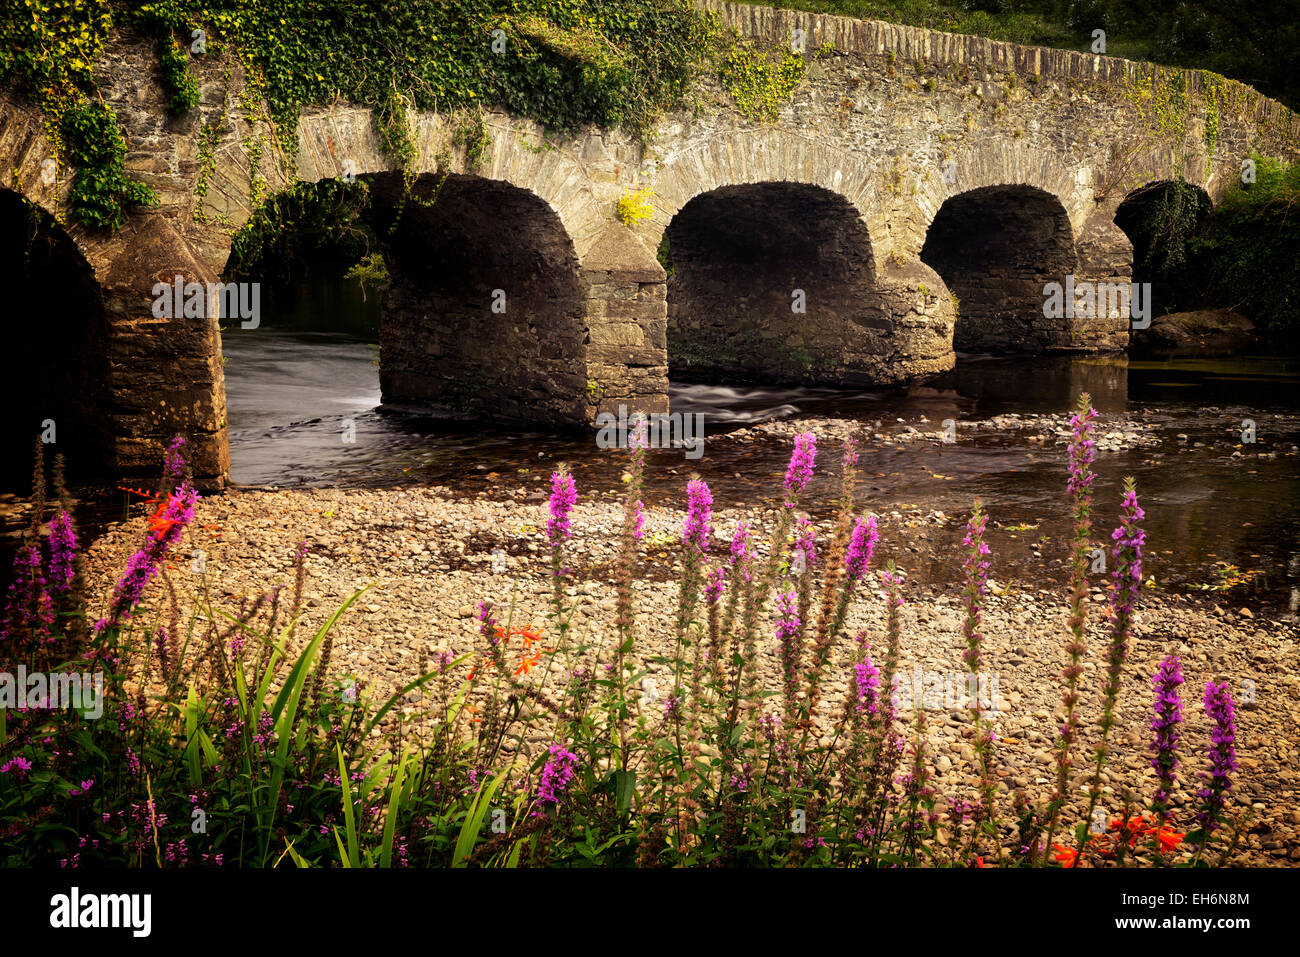 Brücke über den Gearhmeen River mit Wildblumen, Nationalpark Killarney, Irland Stockbild